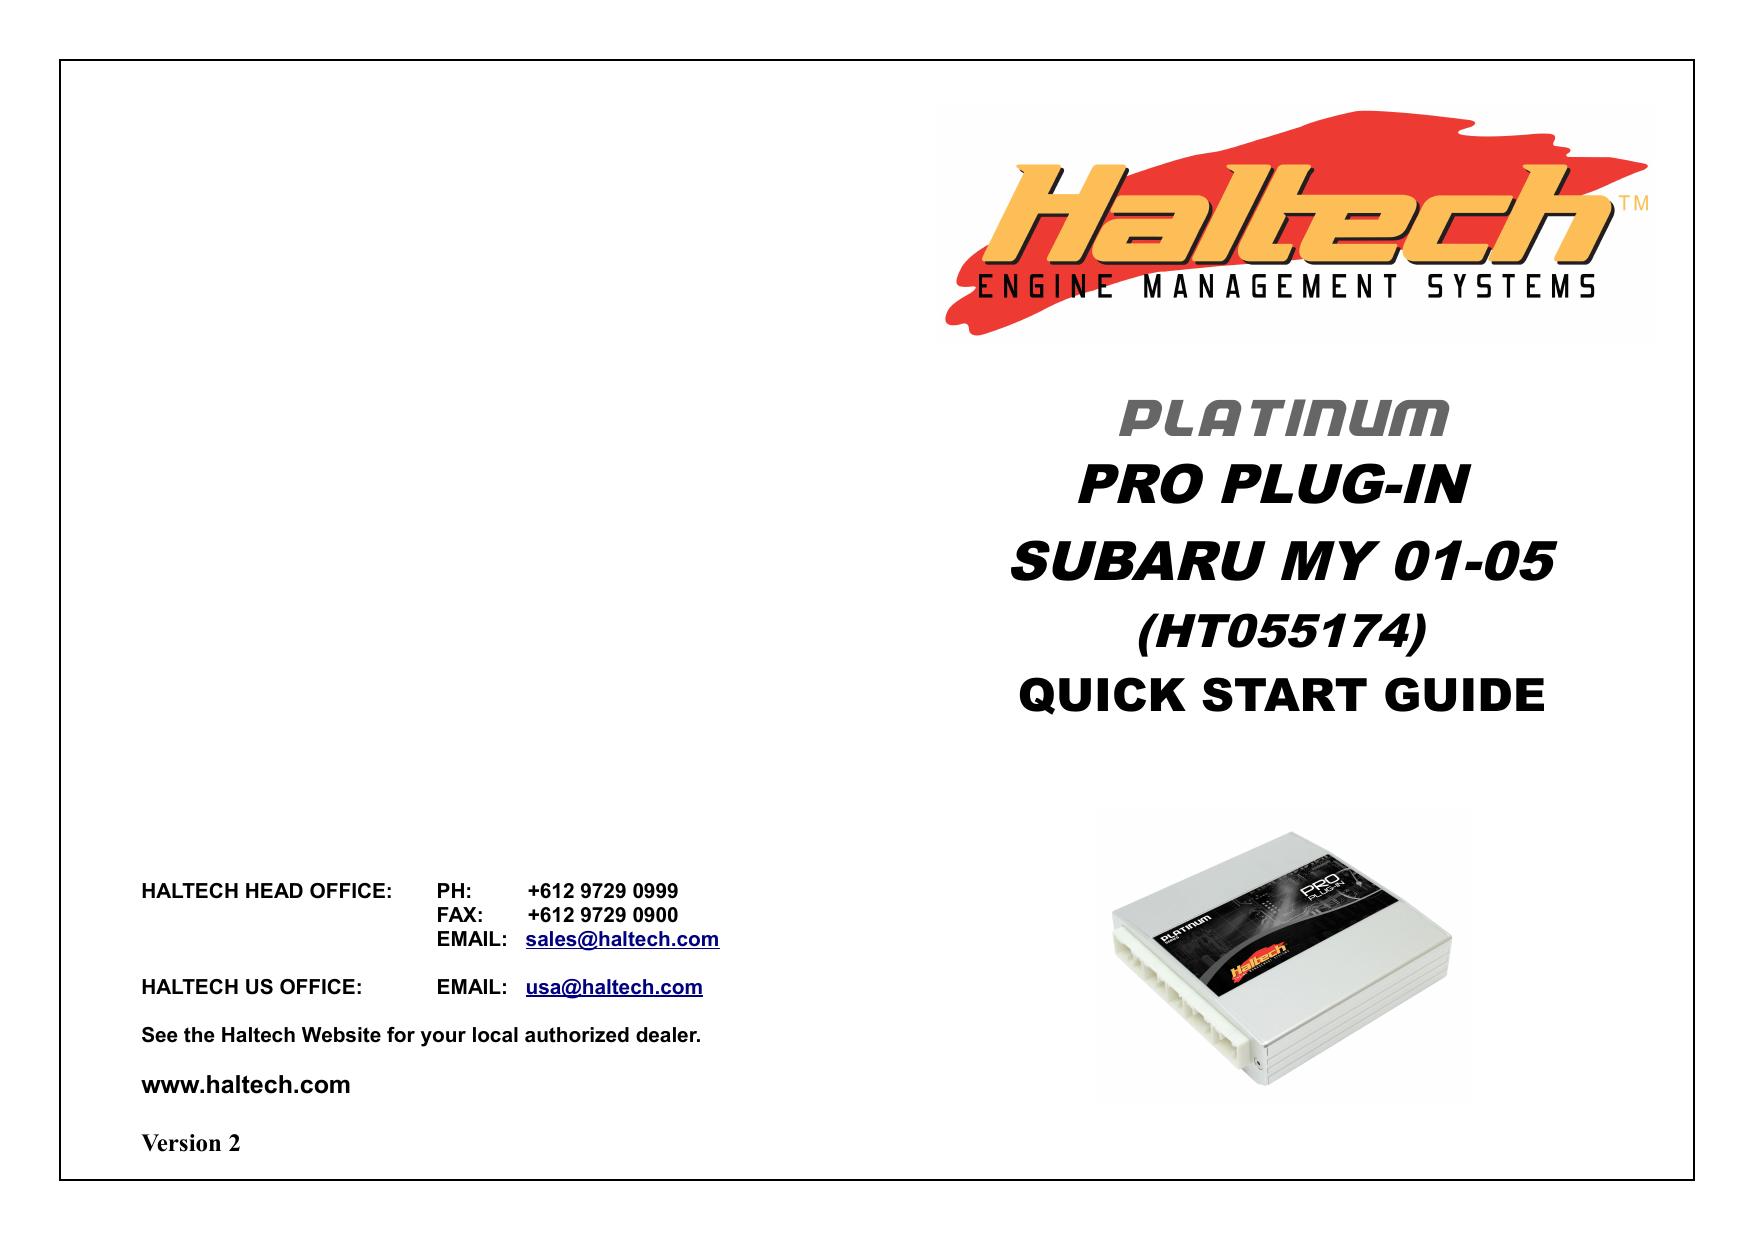 platinum pro plug-in subaru my 01-05   manualzz.com on